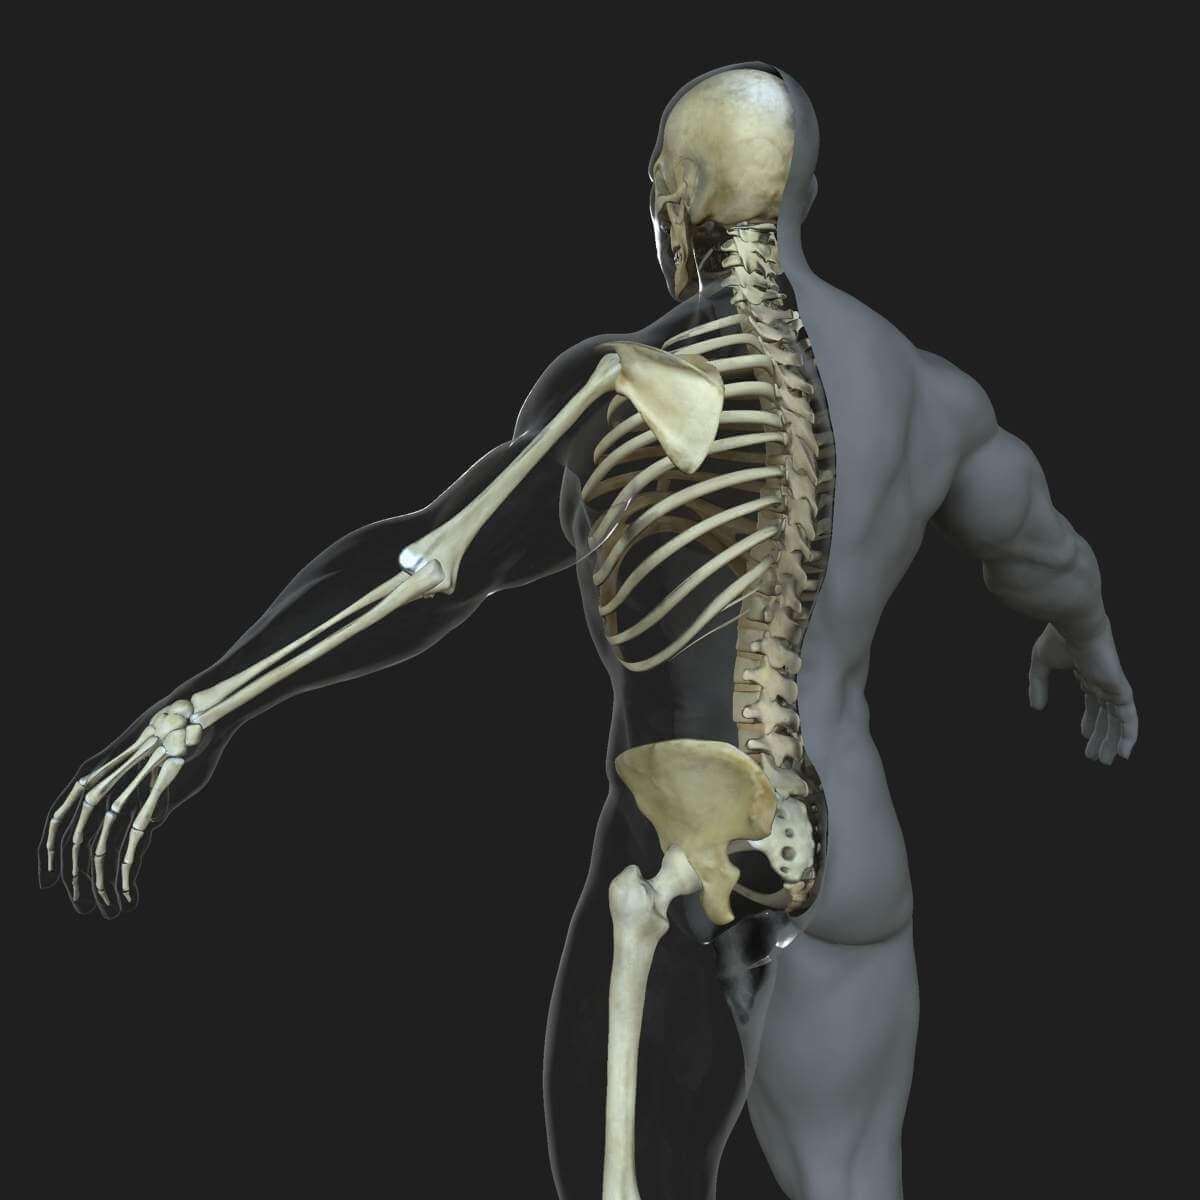 malefemale skeleton with skin combo 3d model